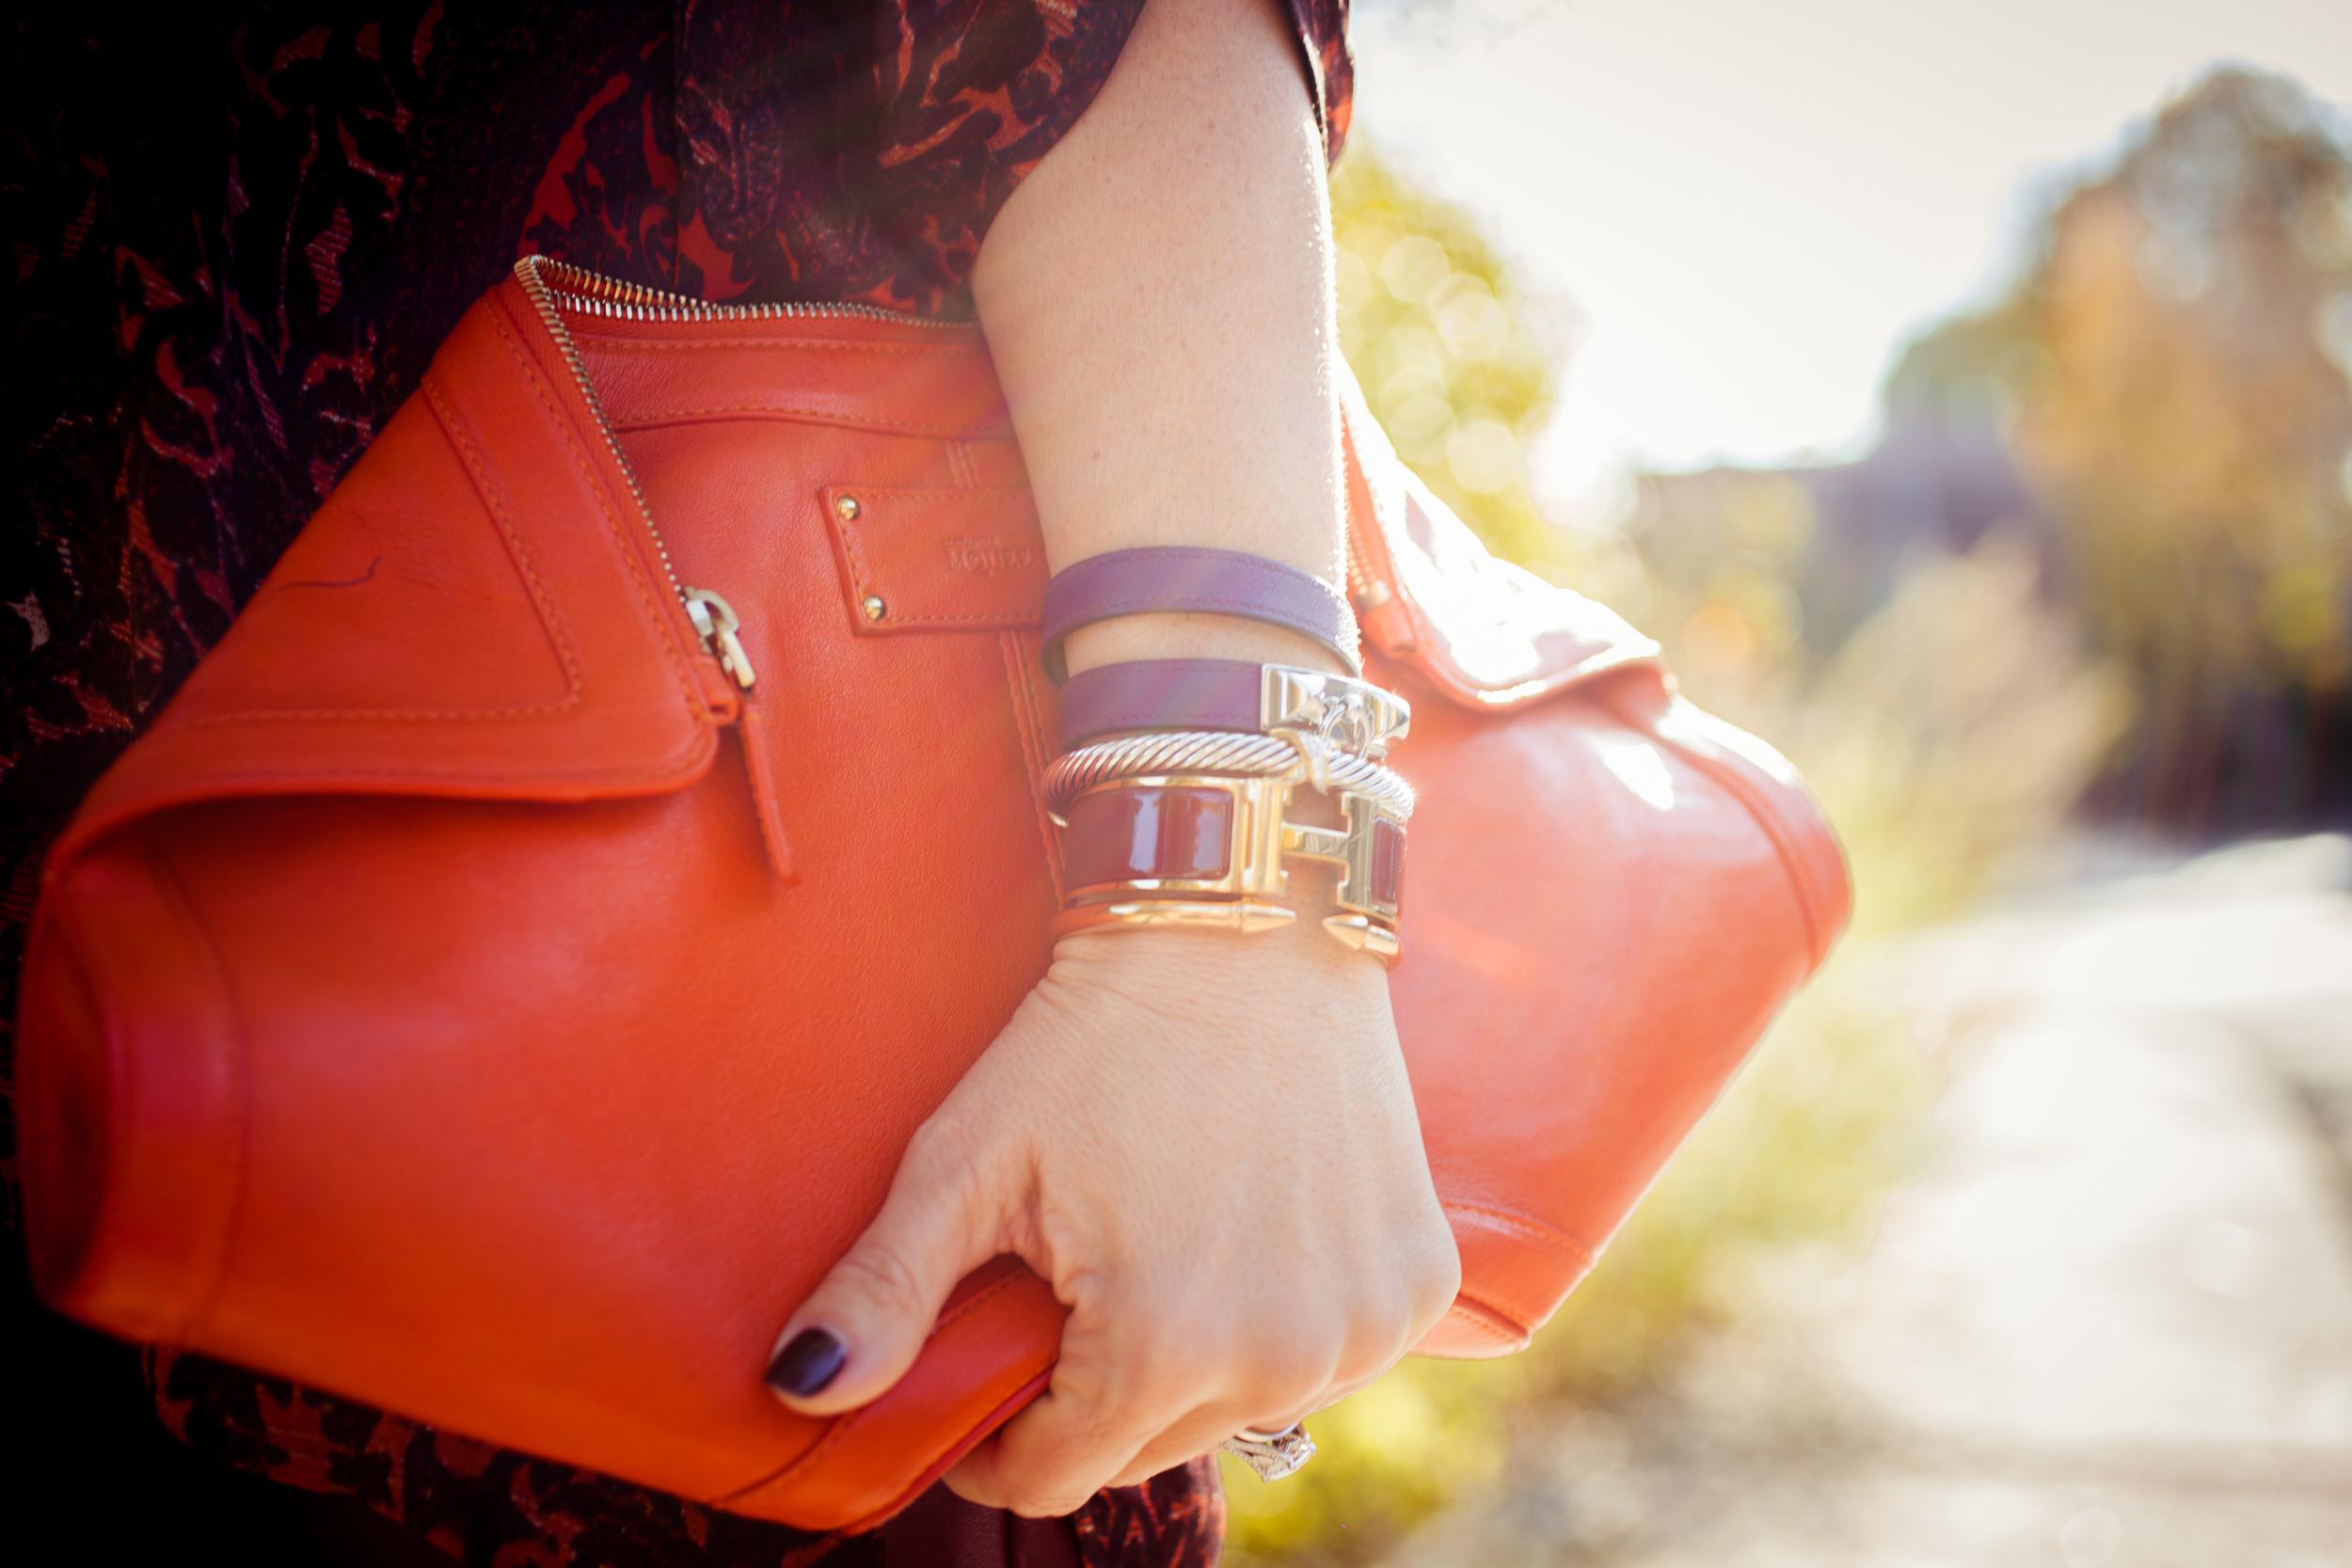 mademoiselle jules mlle alexander mc queen purse bag orange bordeaux hermes bracelet vita fede